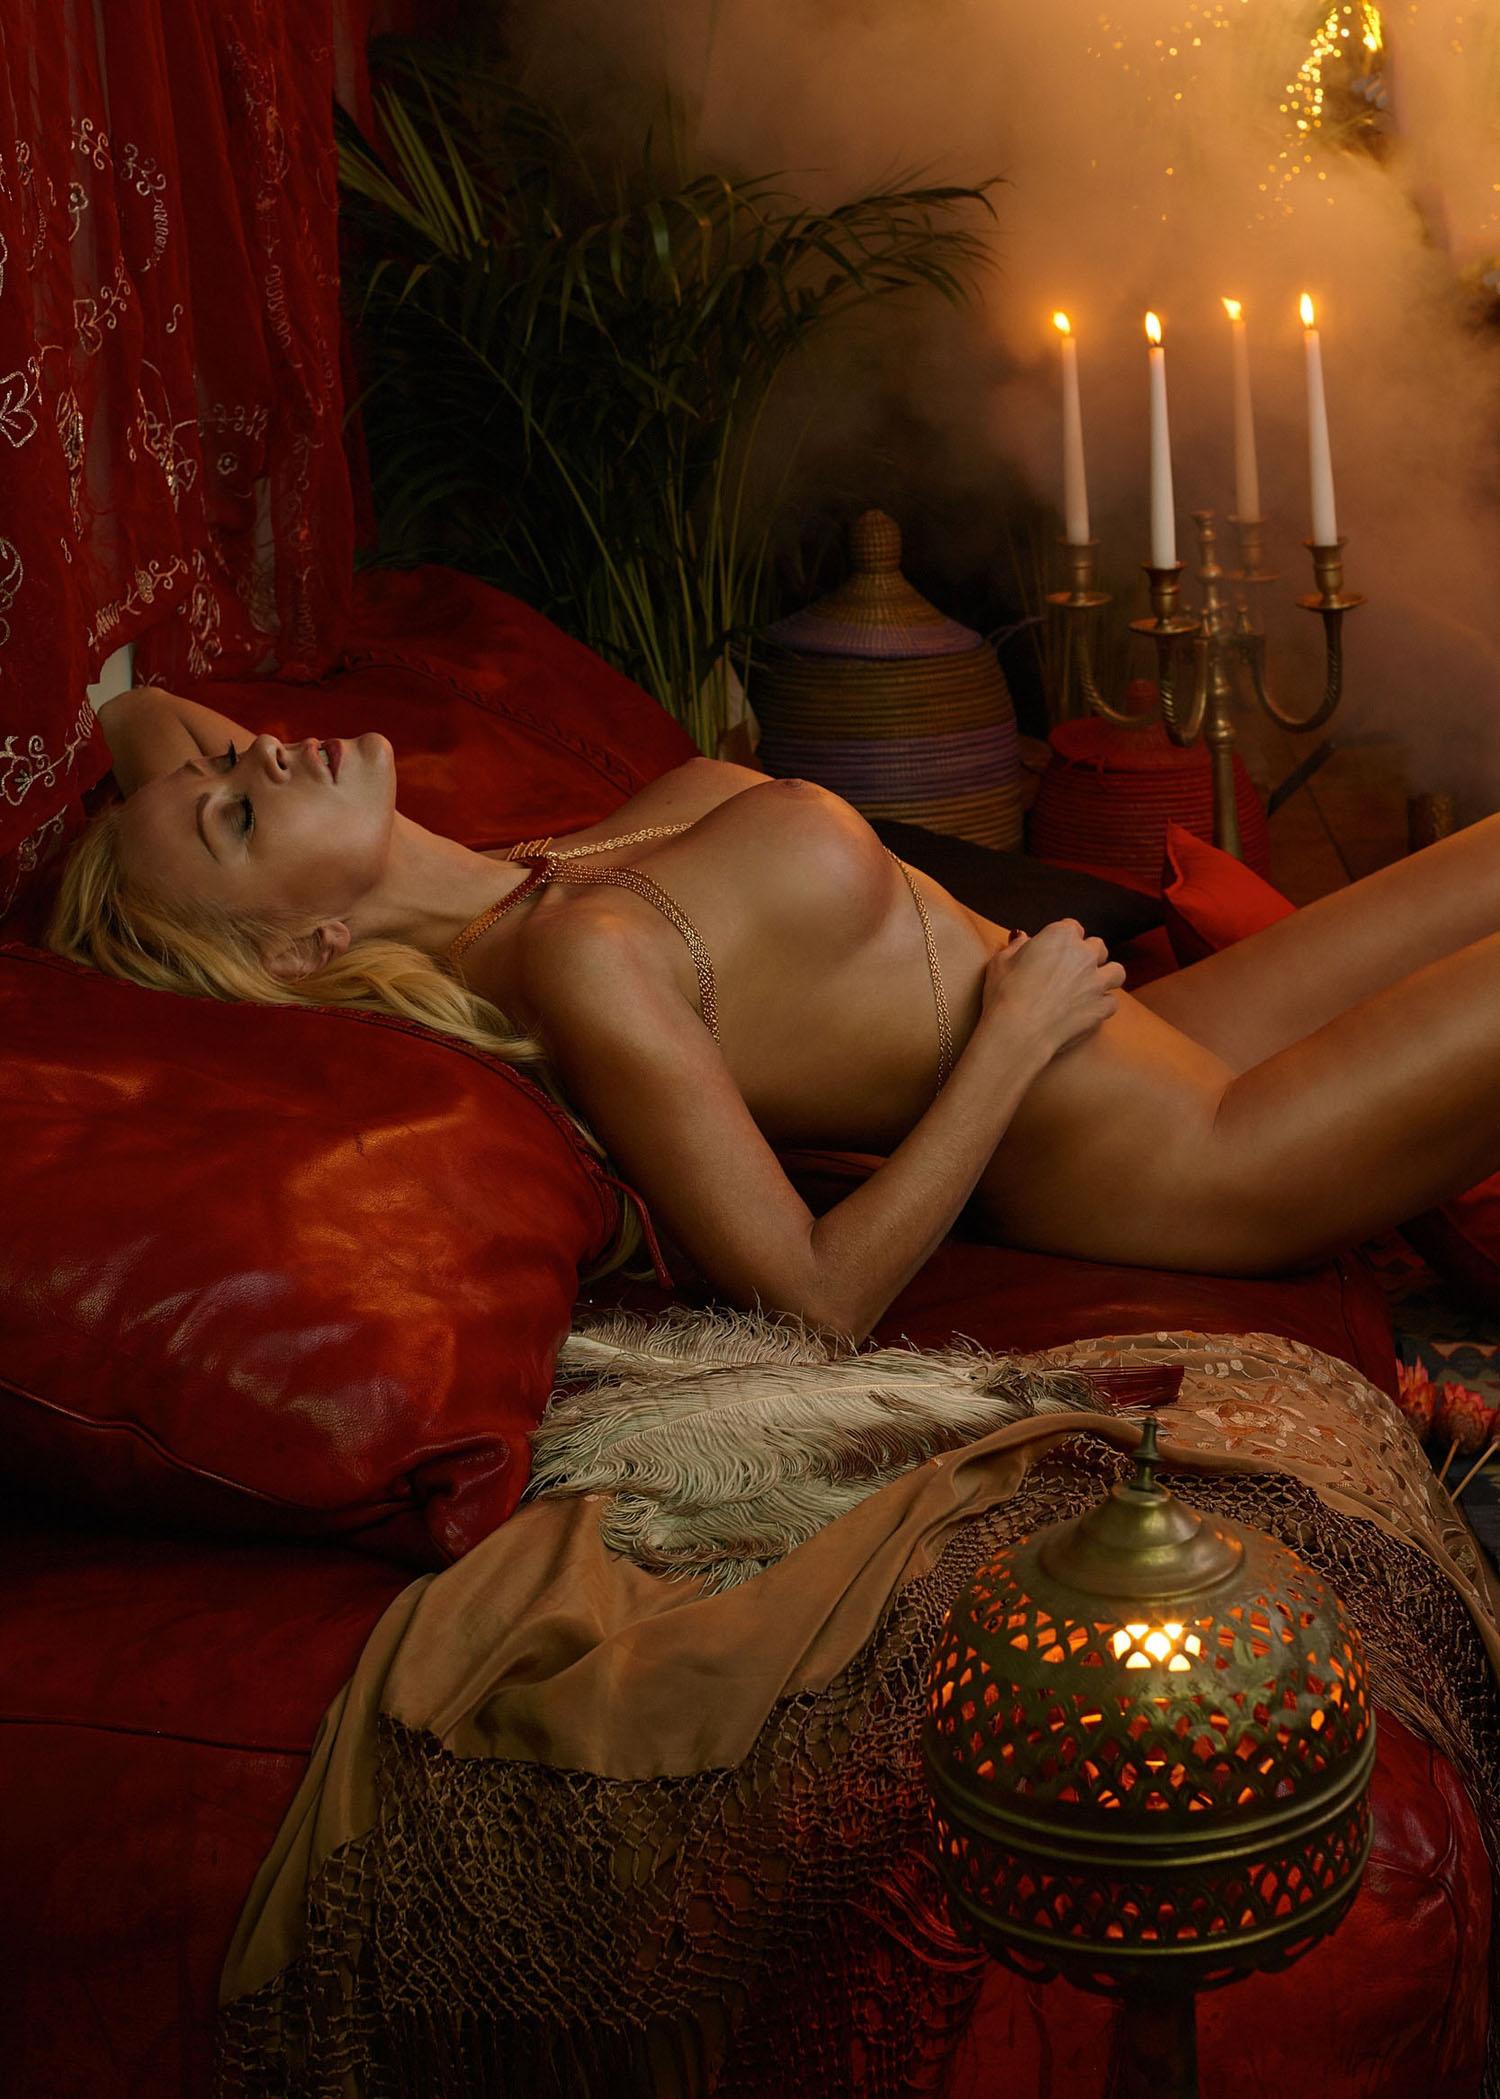 Дженни Элверс голая. Фото - 43